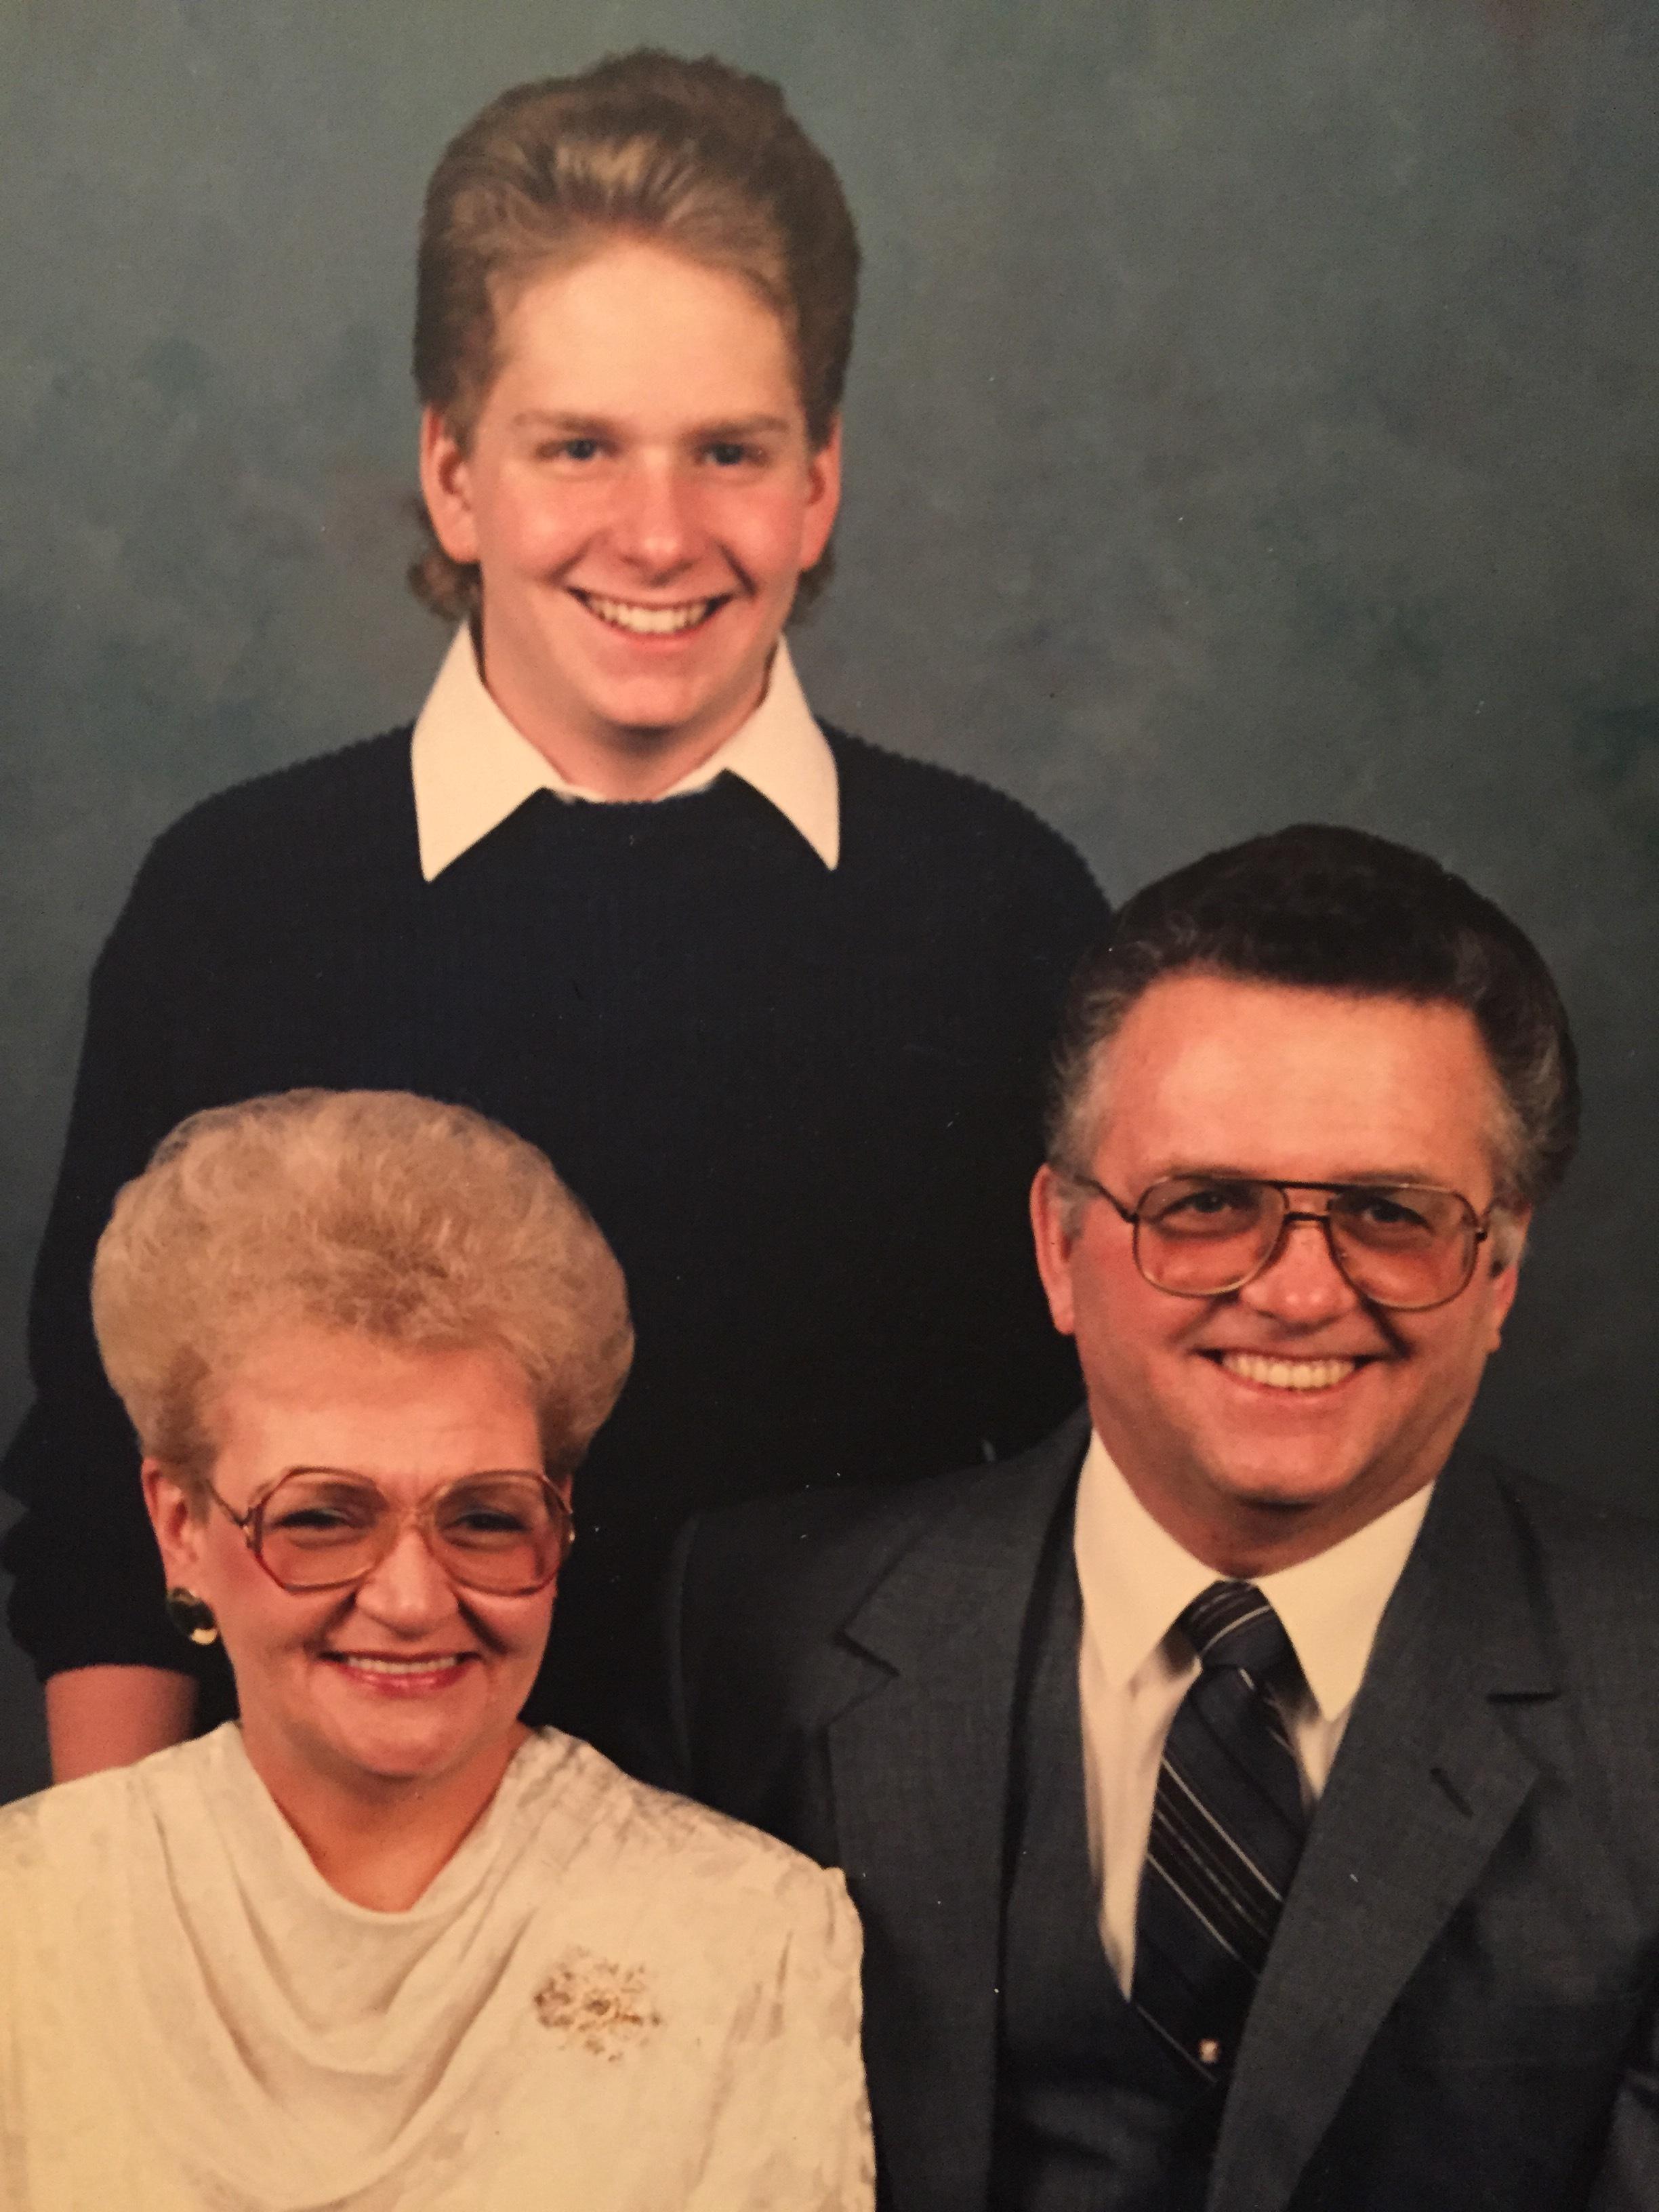 James Robert Dreier: Mr. & Mrs. Dreier and son James